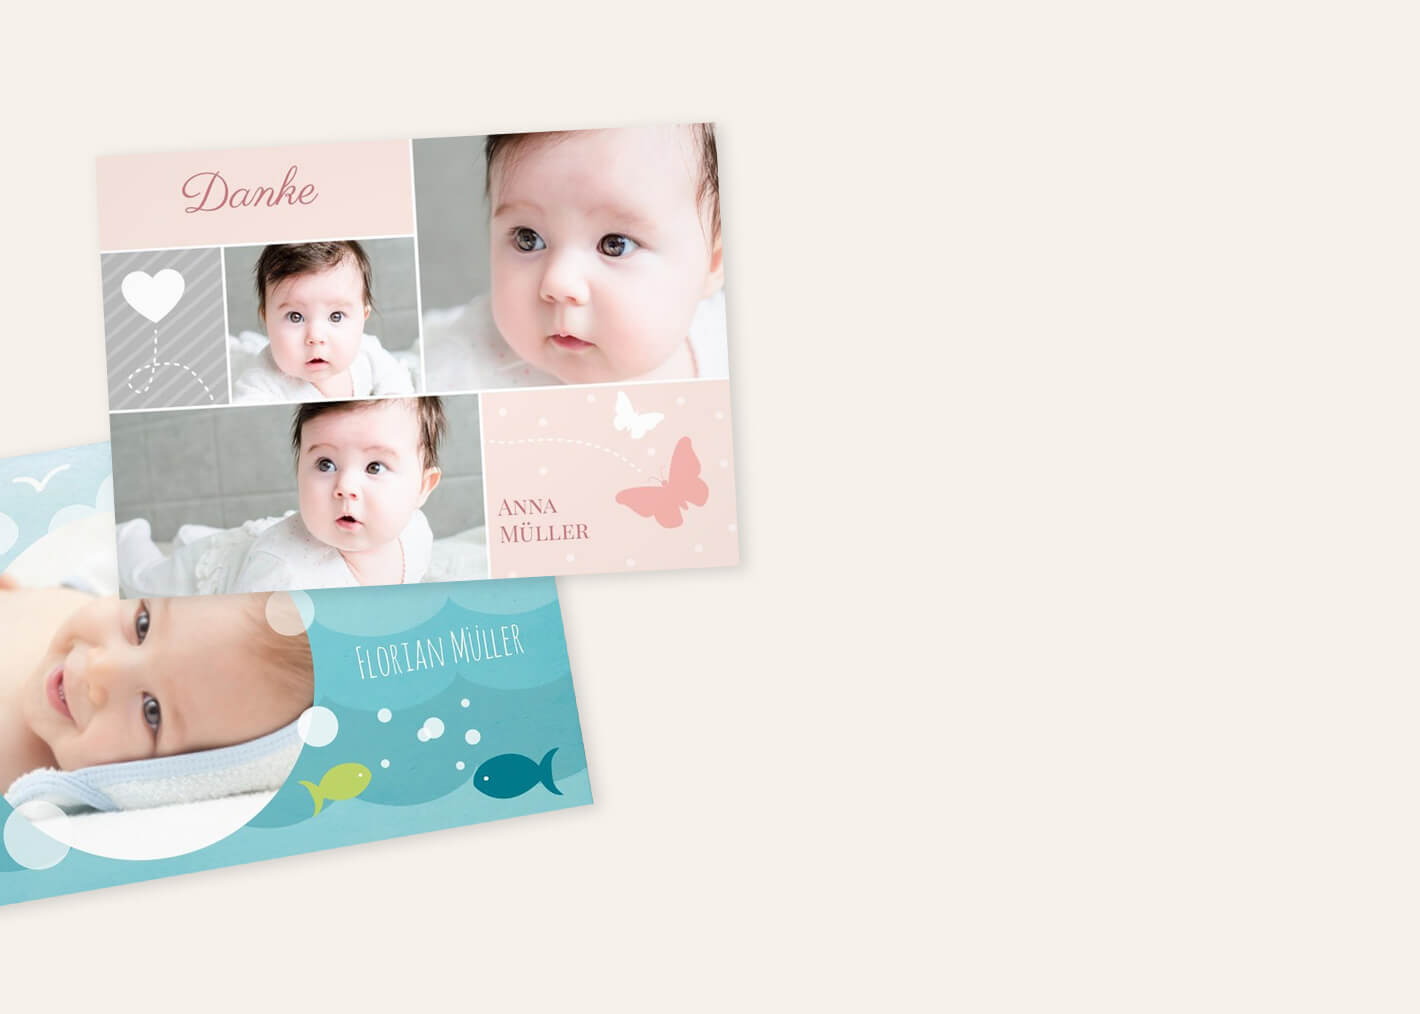 Danksagunskarten zur Taufe